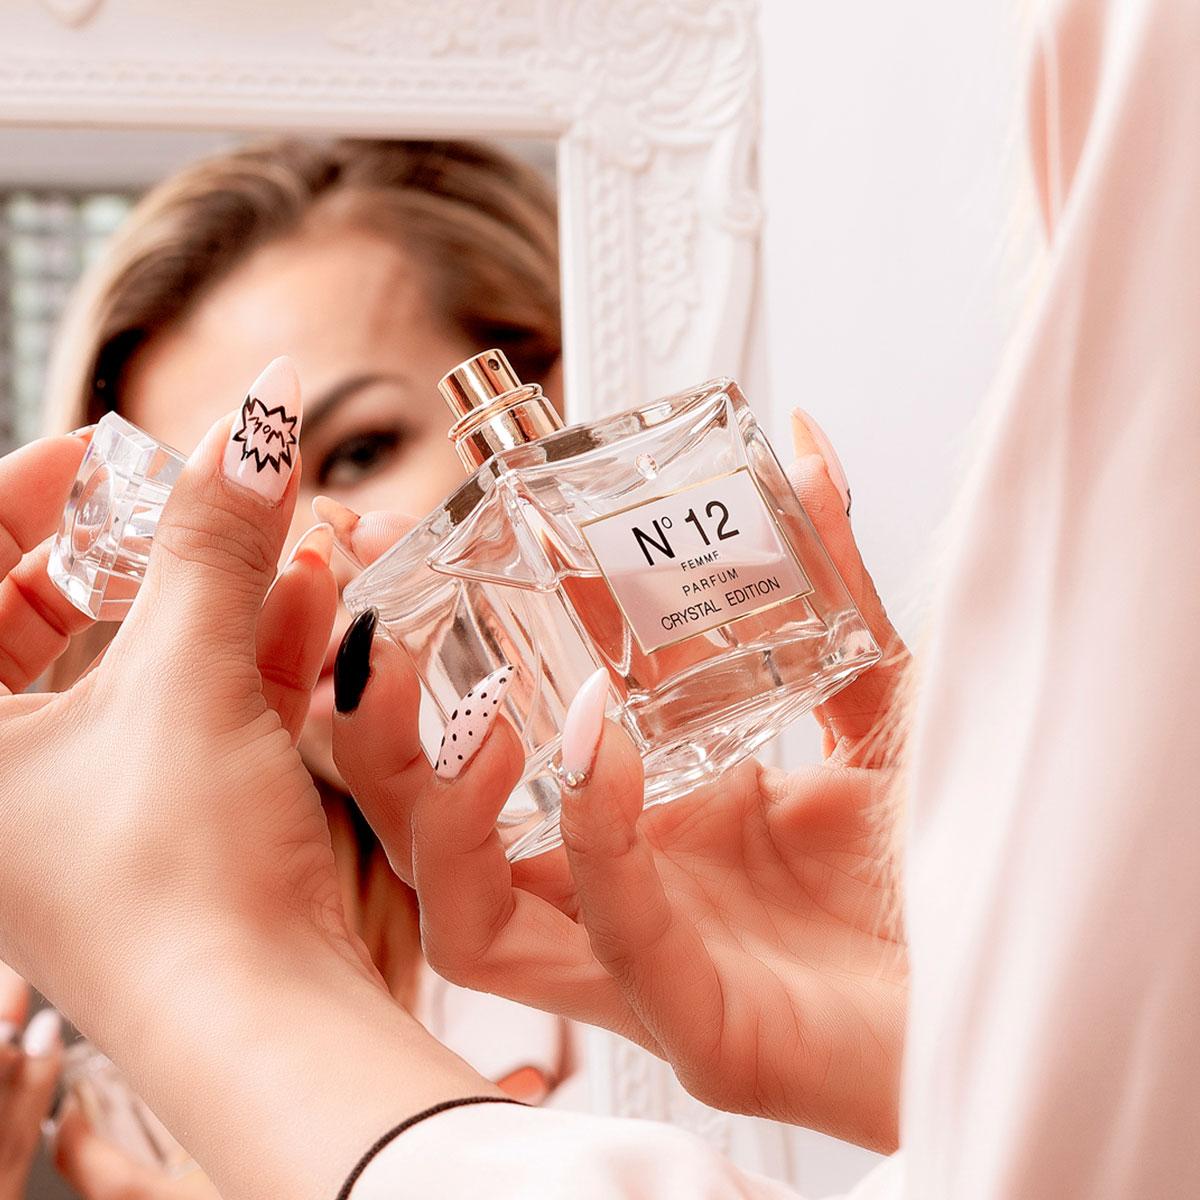 Perfume advertising